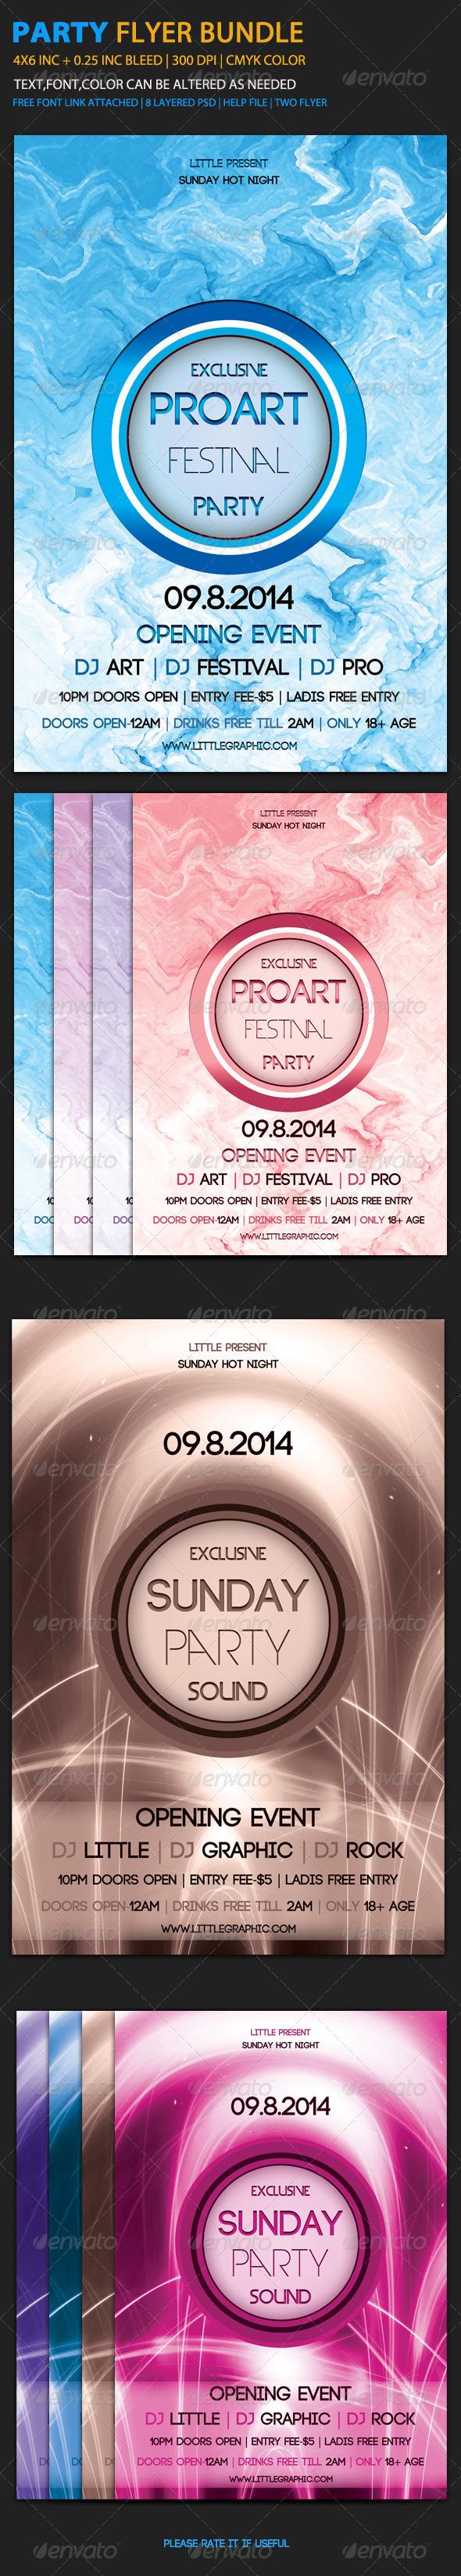 Party Flyer Bundle 1 - Clubs & Parties Events